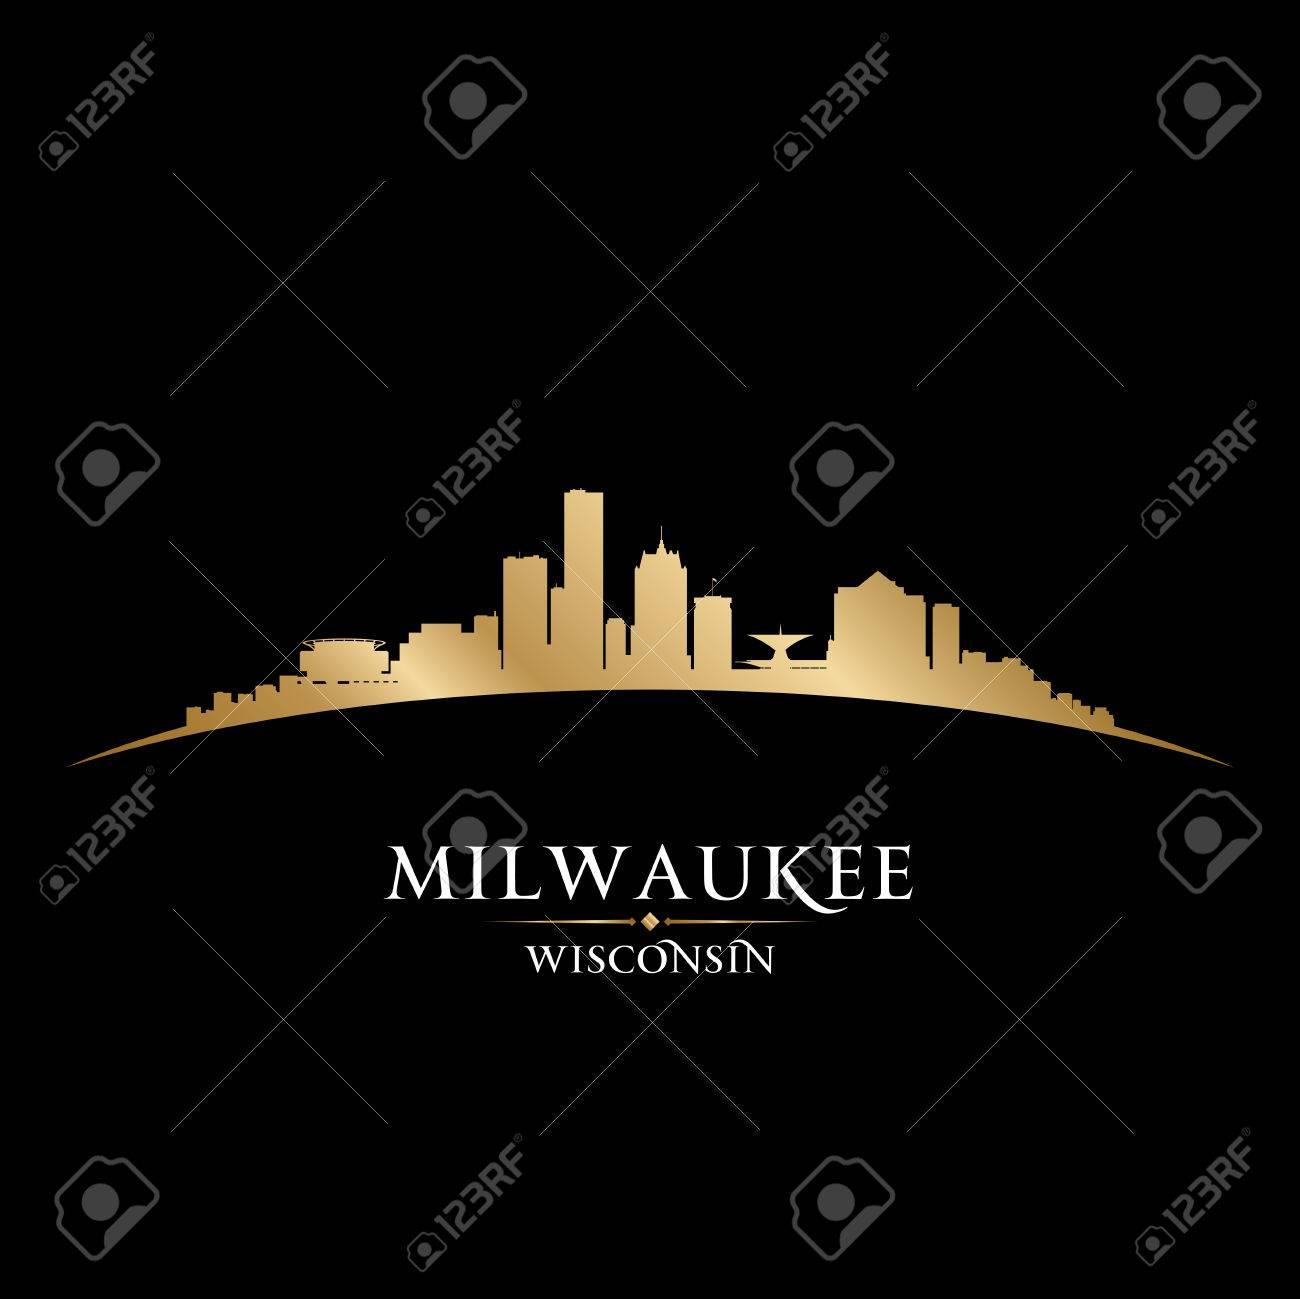 Milwaukee Wisconsin city skyline silhouette. Vector illustration Stock Vector - 22726531